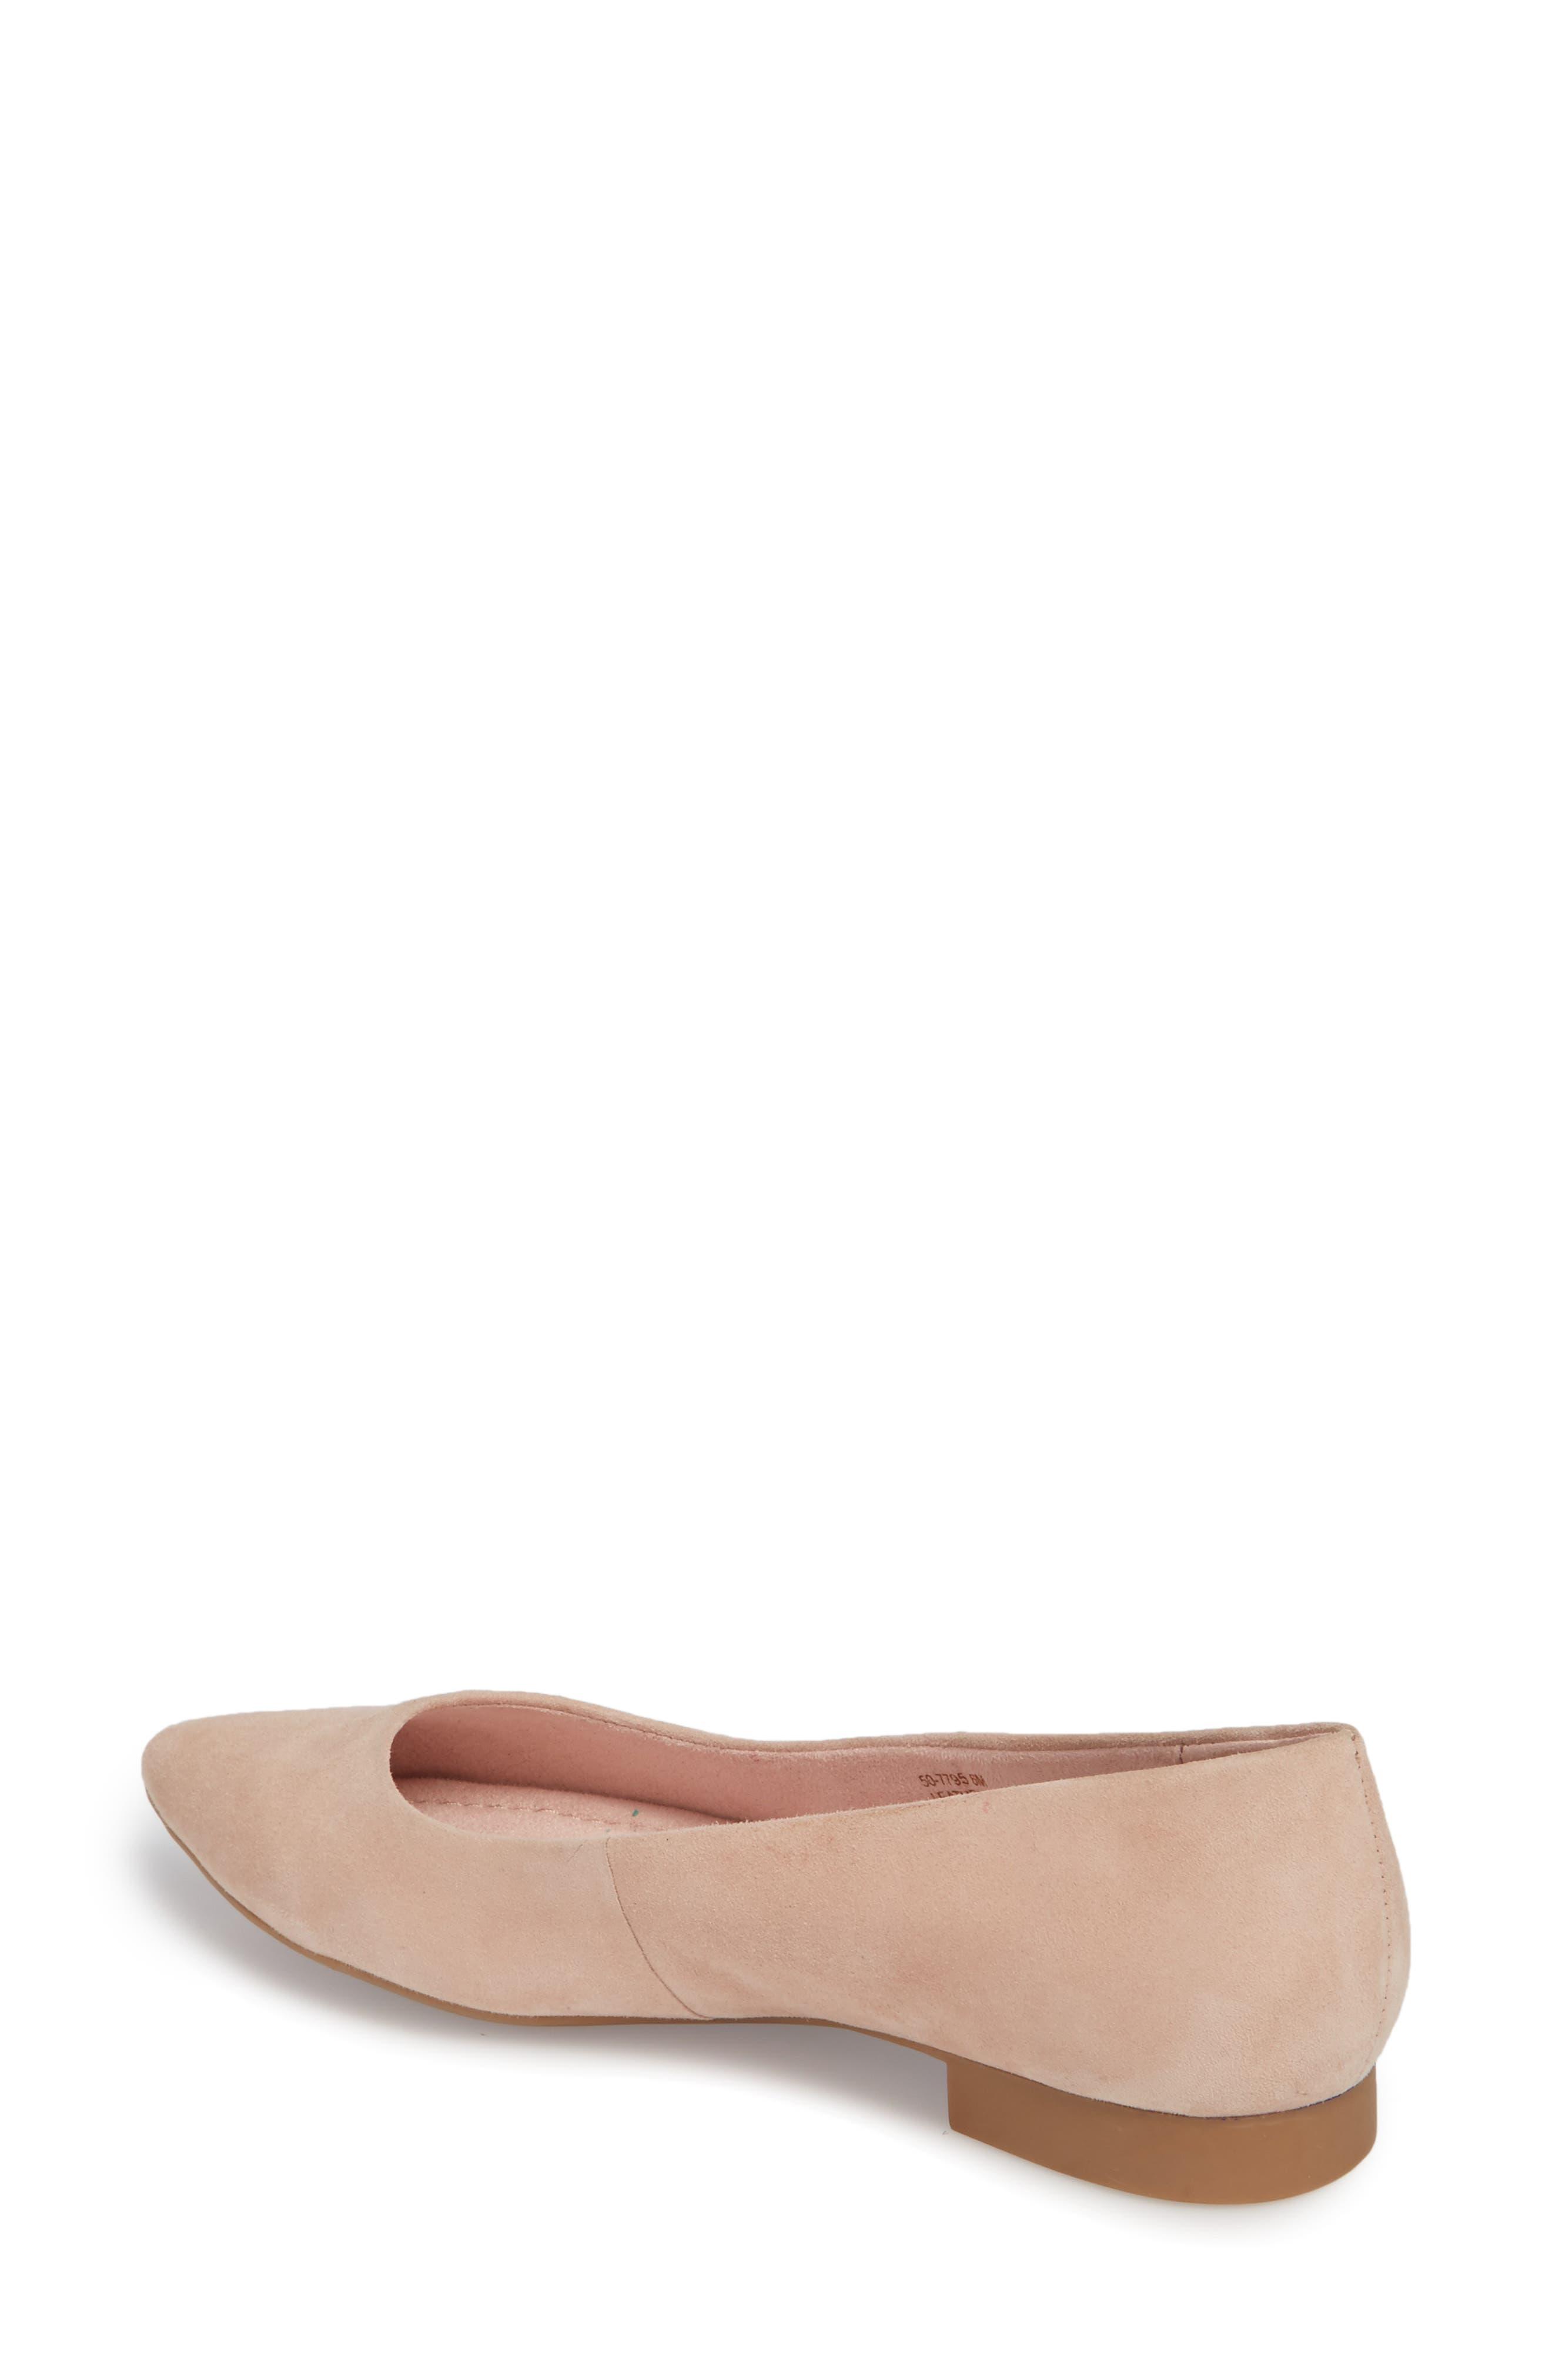 BELLA VITA, 'Vivien' Pointy Toe Flat, Alternate thumbnail 2, color, BLUSH SUEDE